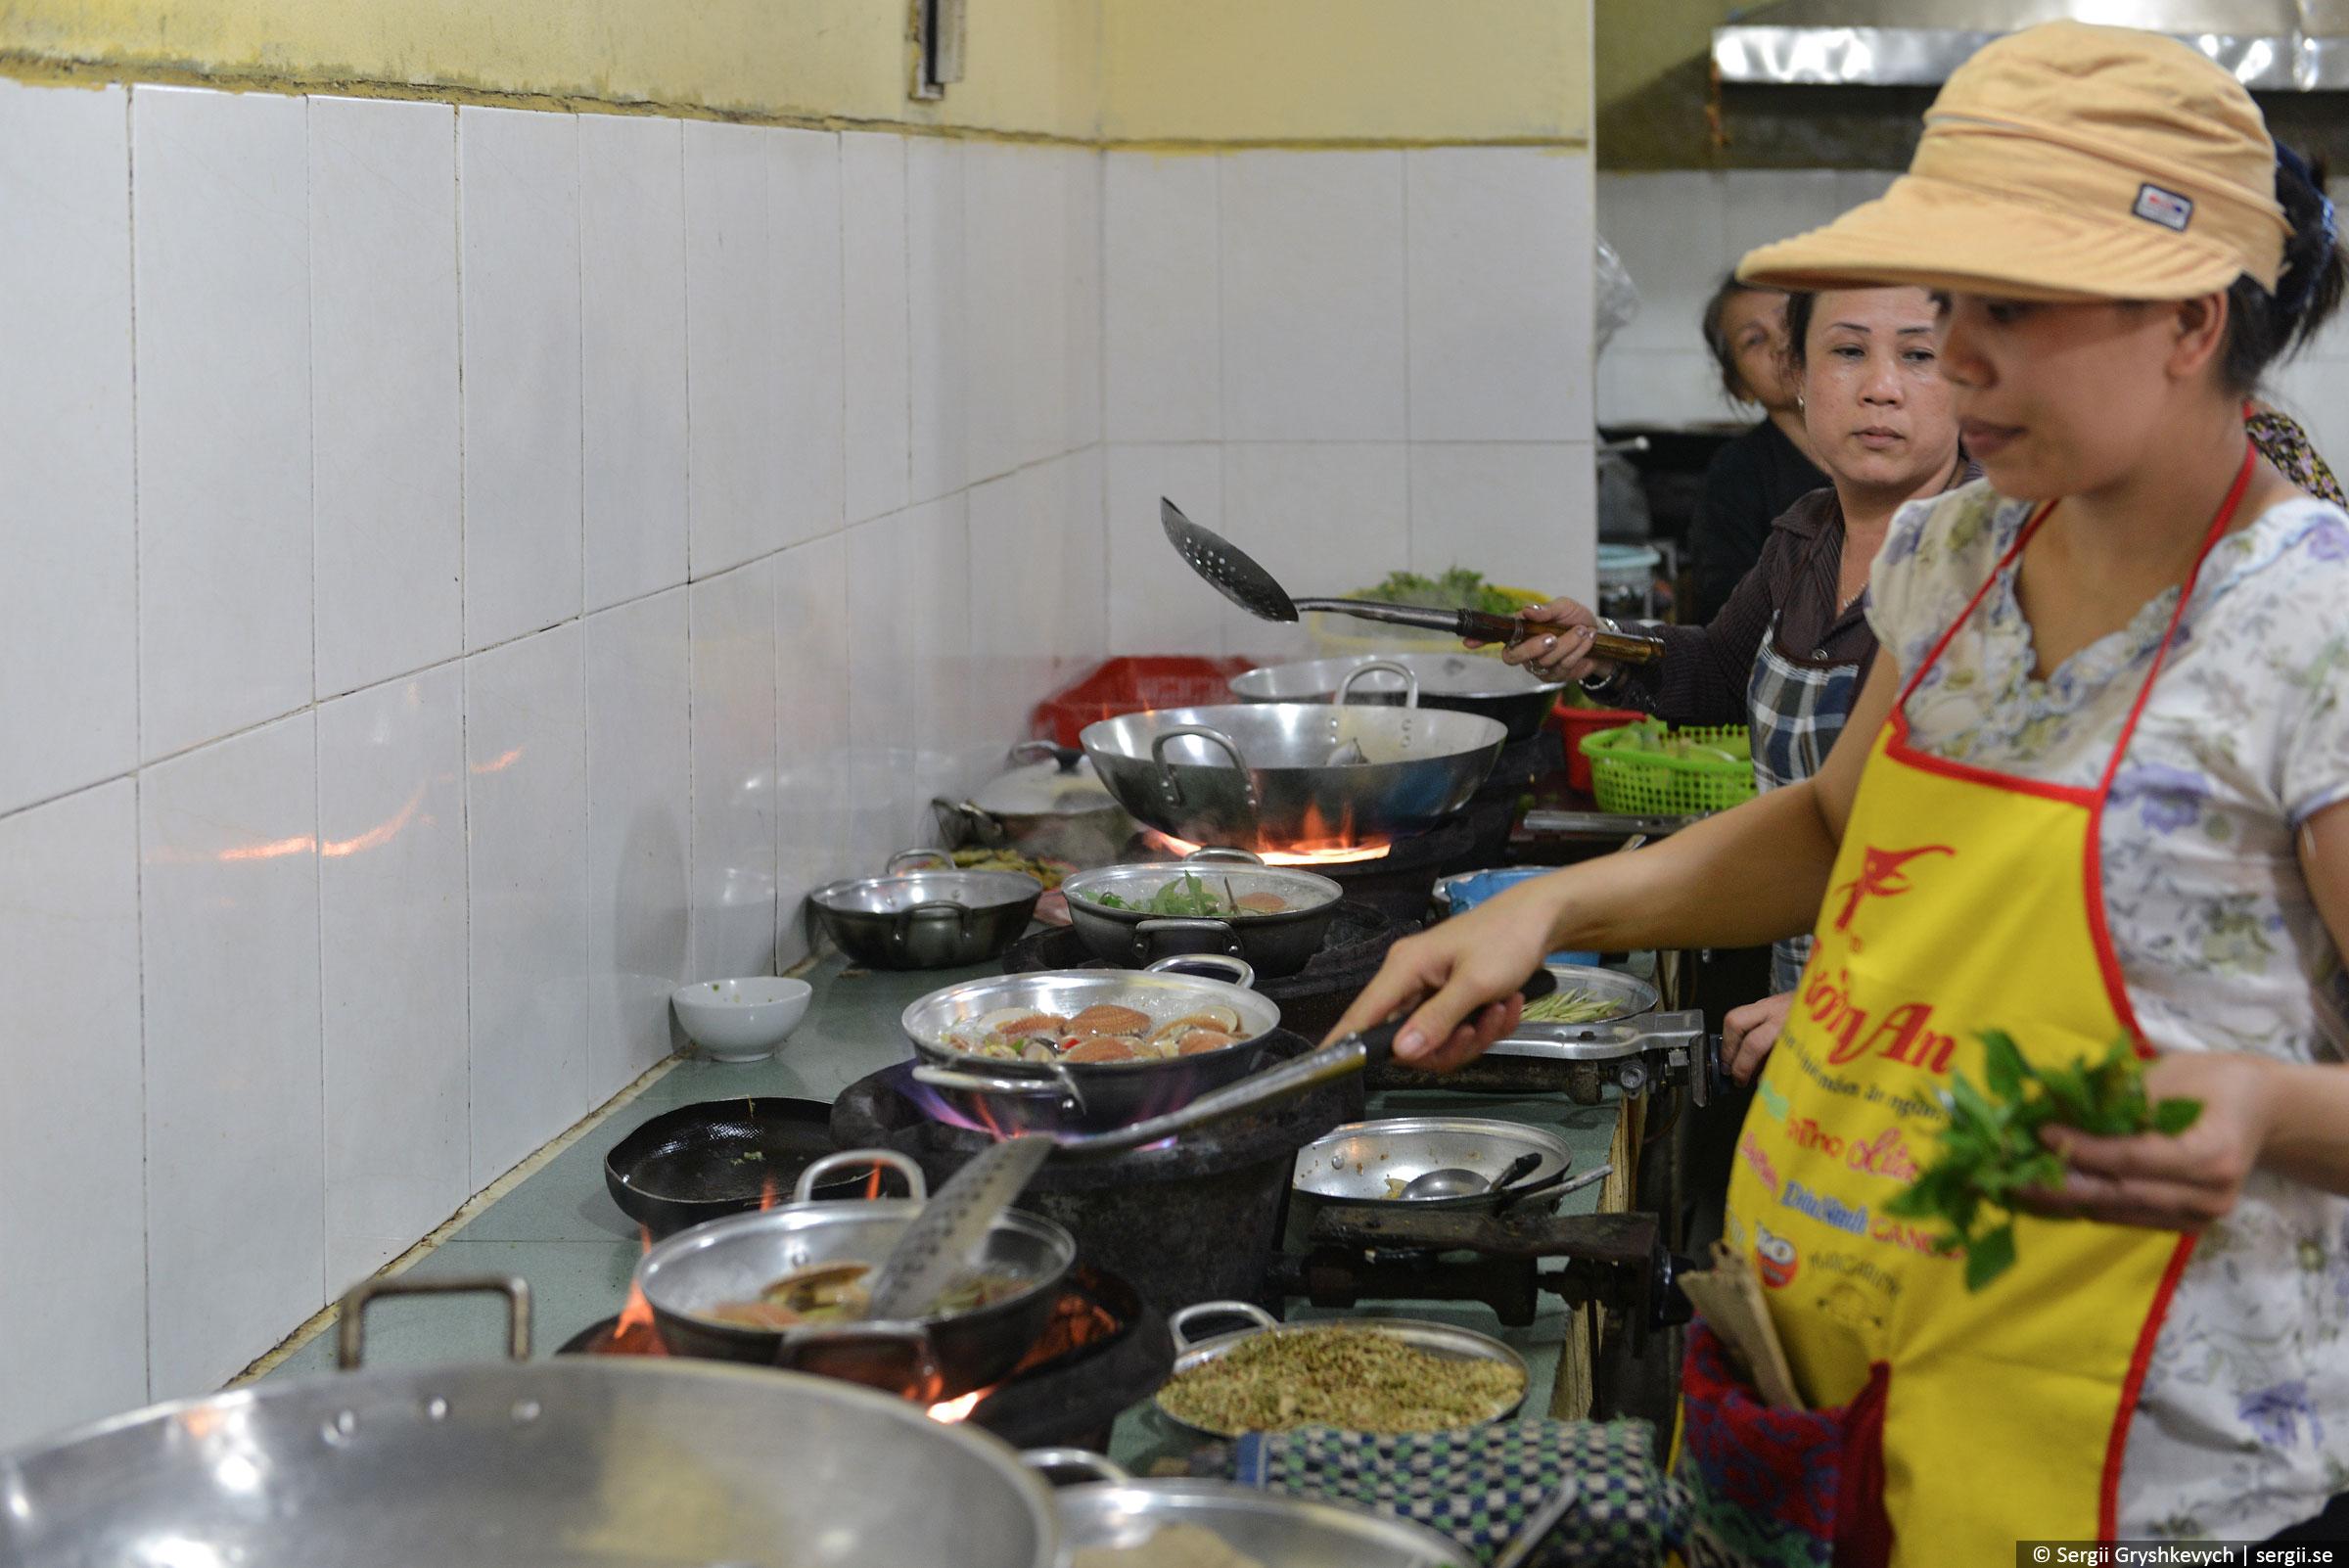 da-nang-vietnam-2014-43